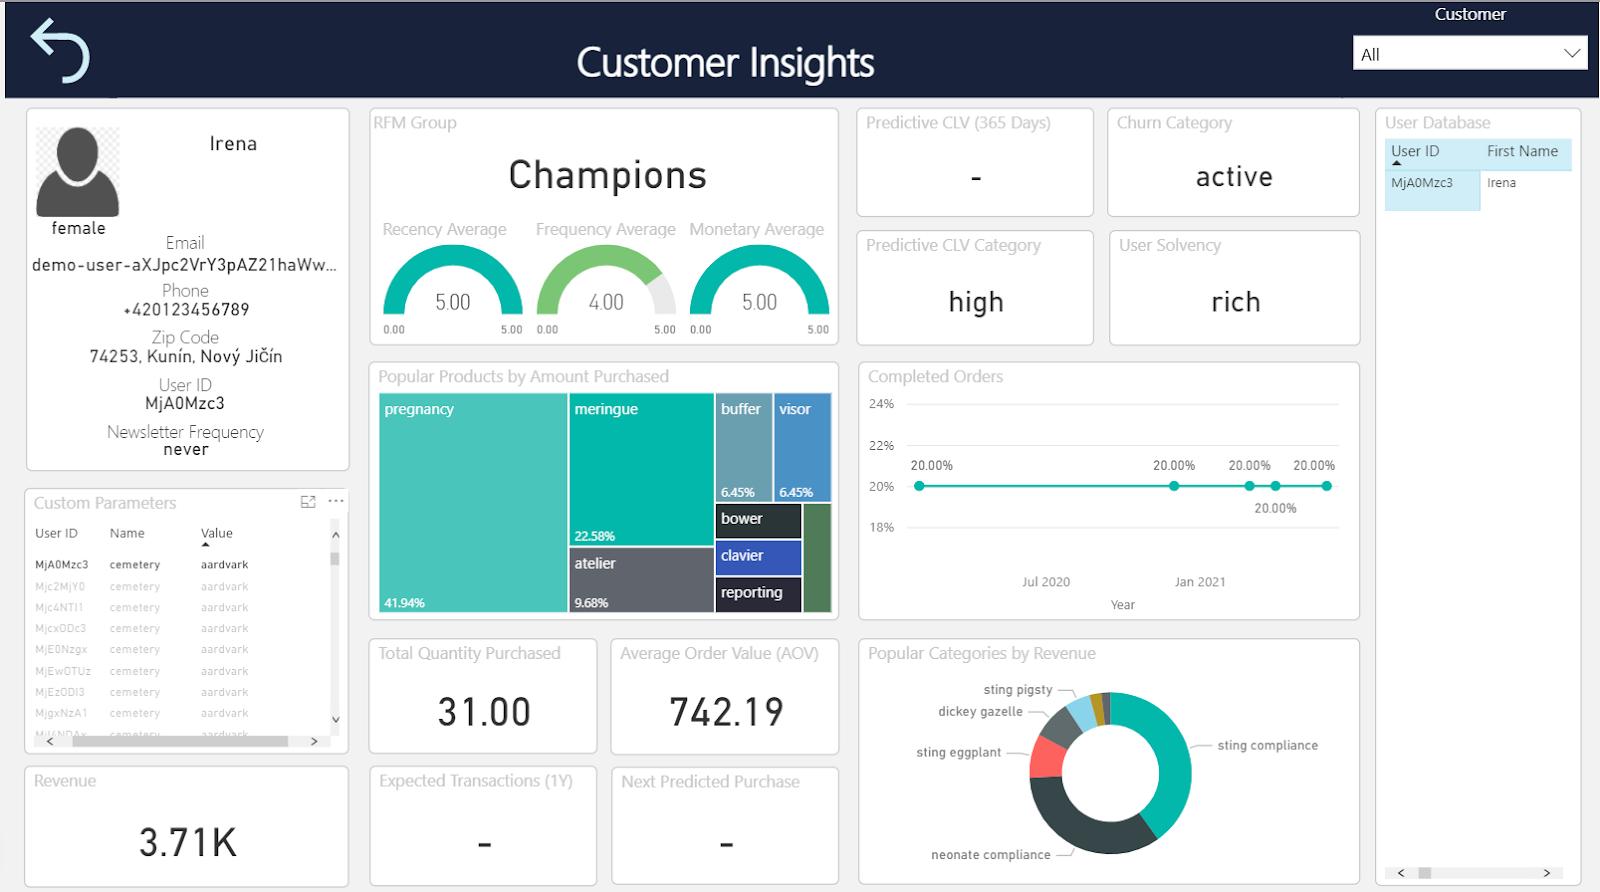 360 Degree Customer View report from Samba.ai